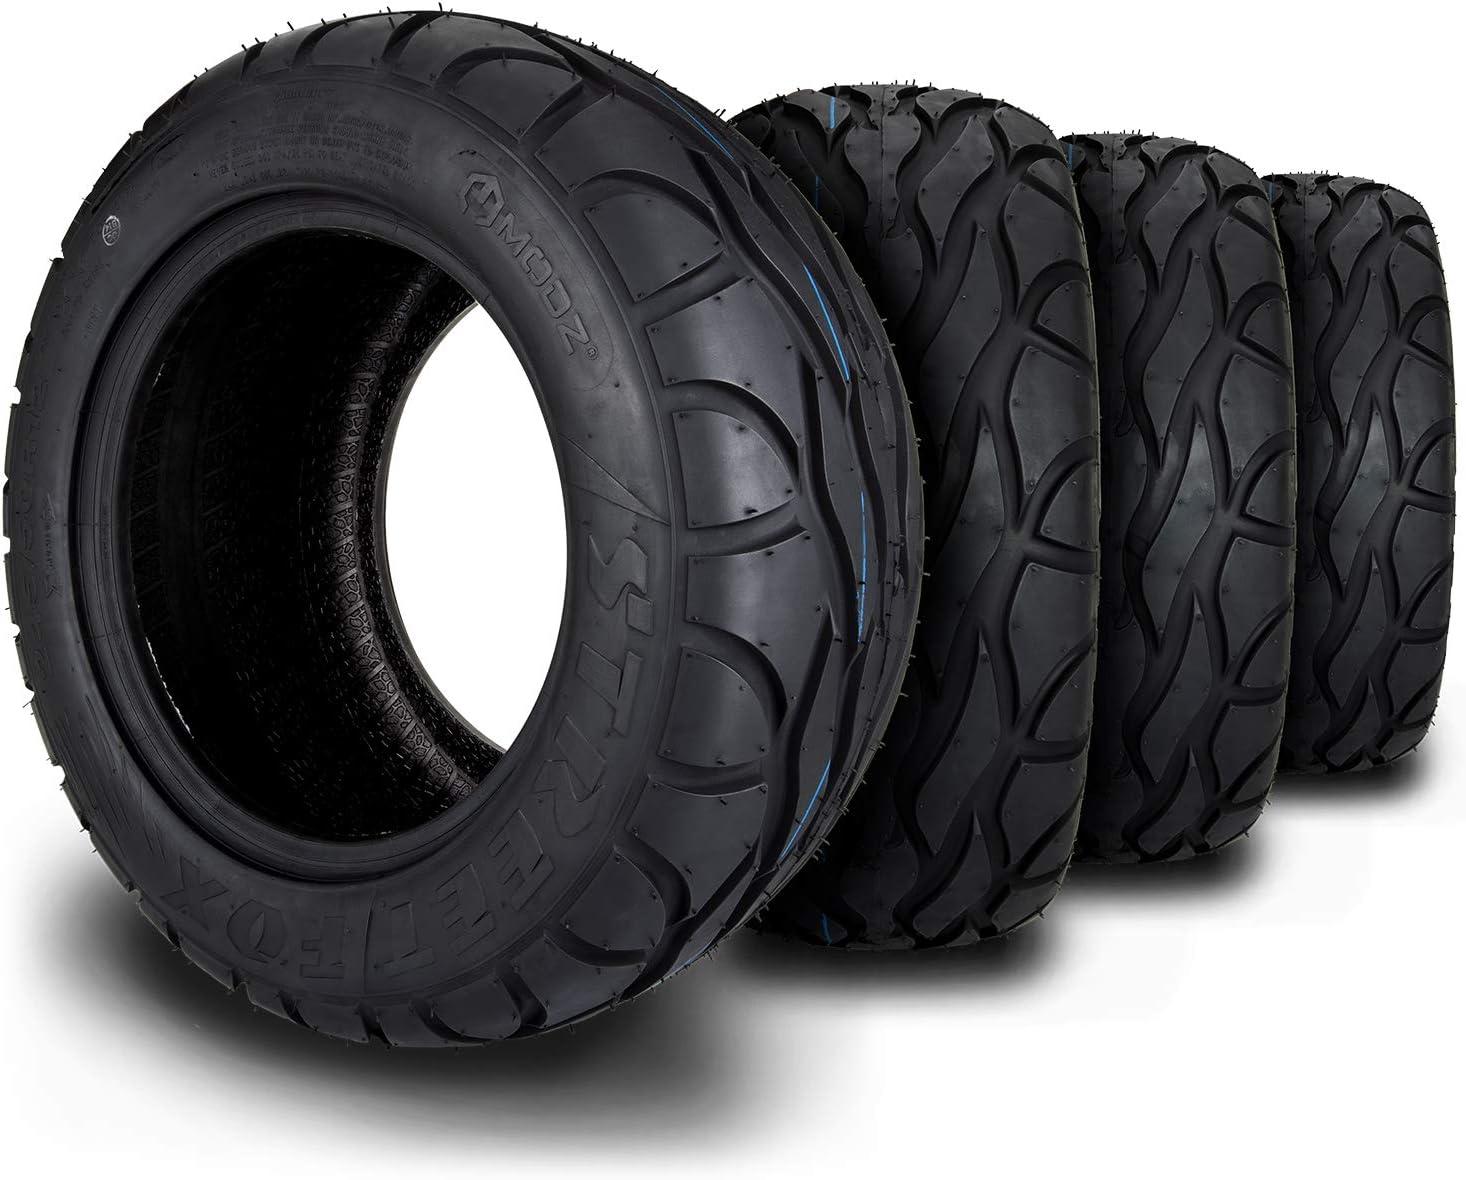 MODZ Street Fox 245 50-12 Radial Golf of Max 55% OFF Four Tire unisex Cart Set -